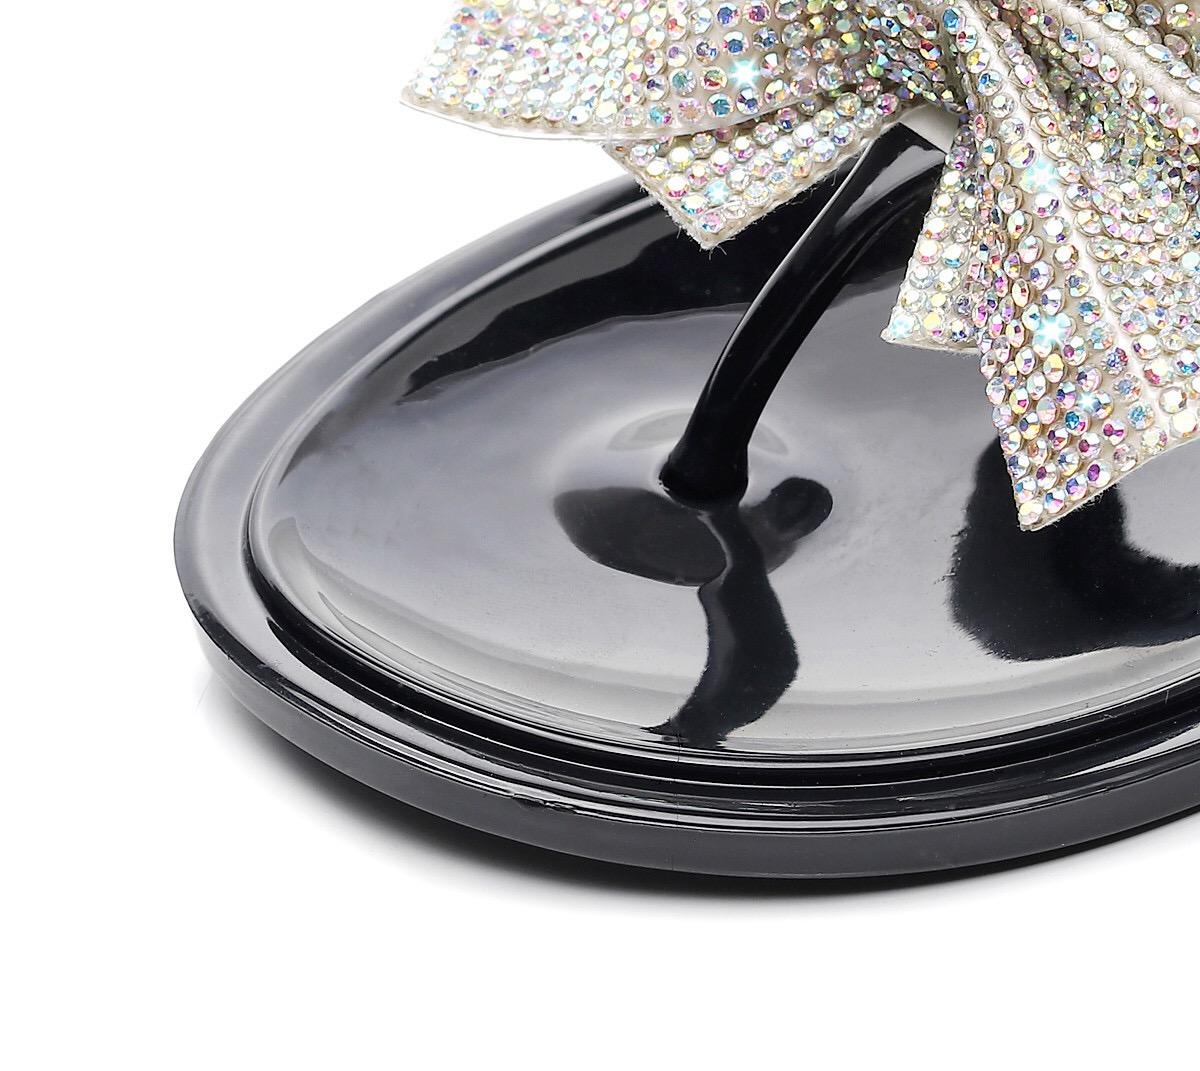 Beach Flip Flop Pvc Jelly Slipper 2019 New Product Shoes Jieyang Raw Material Pcu Lady Plastic Flat Woman Summer Sandal